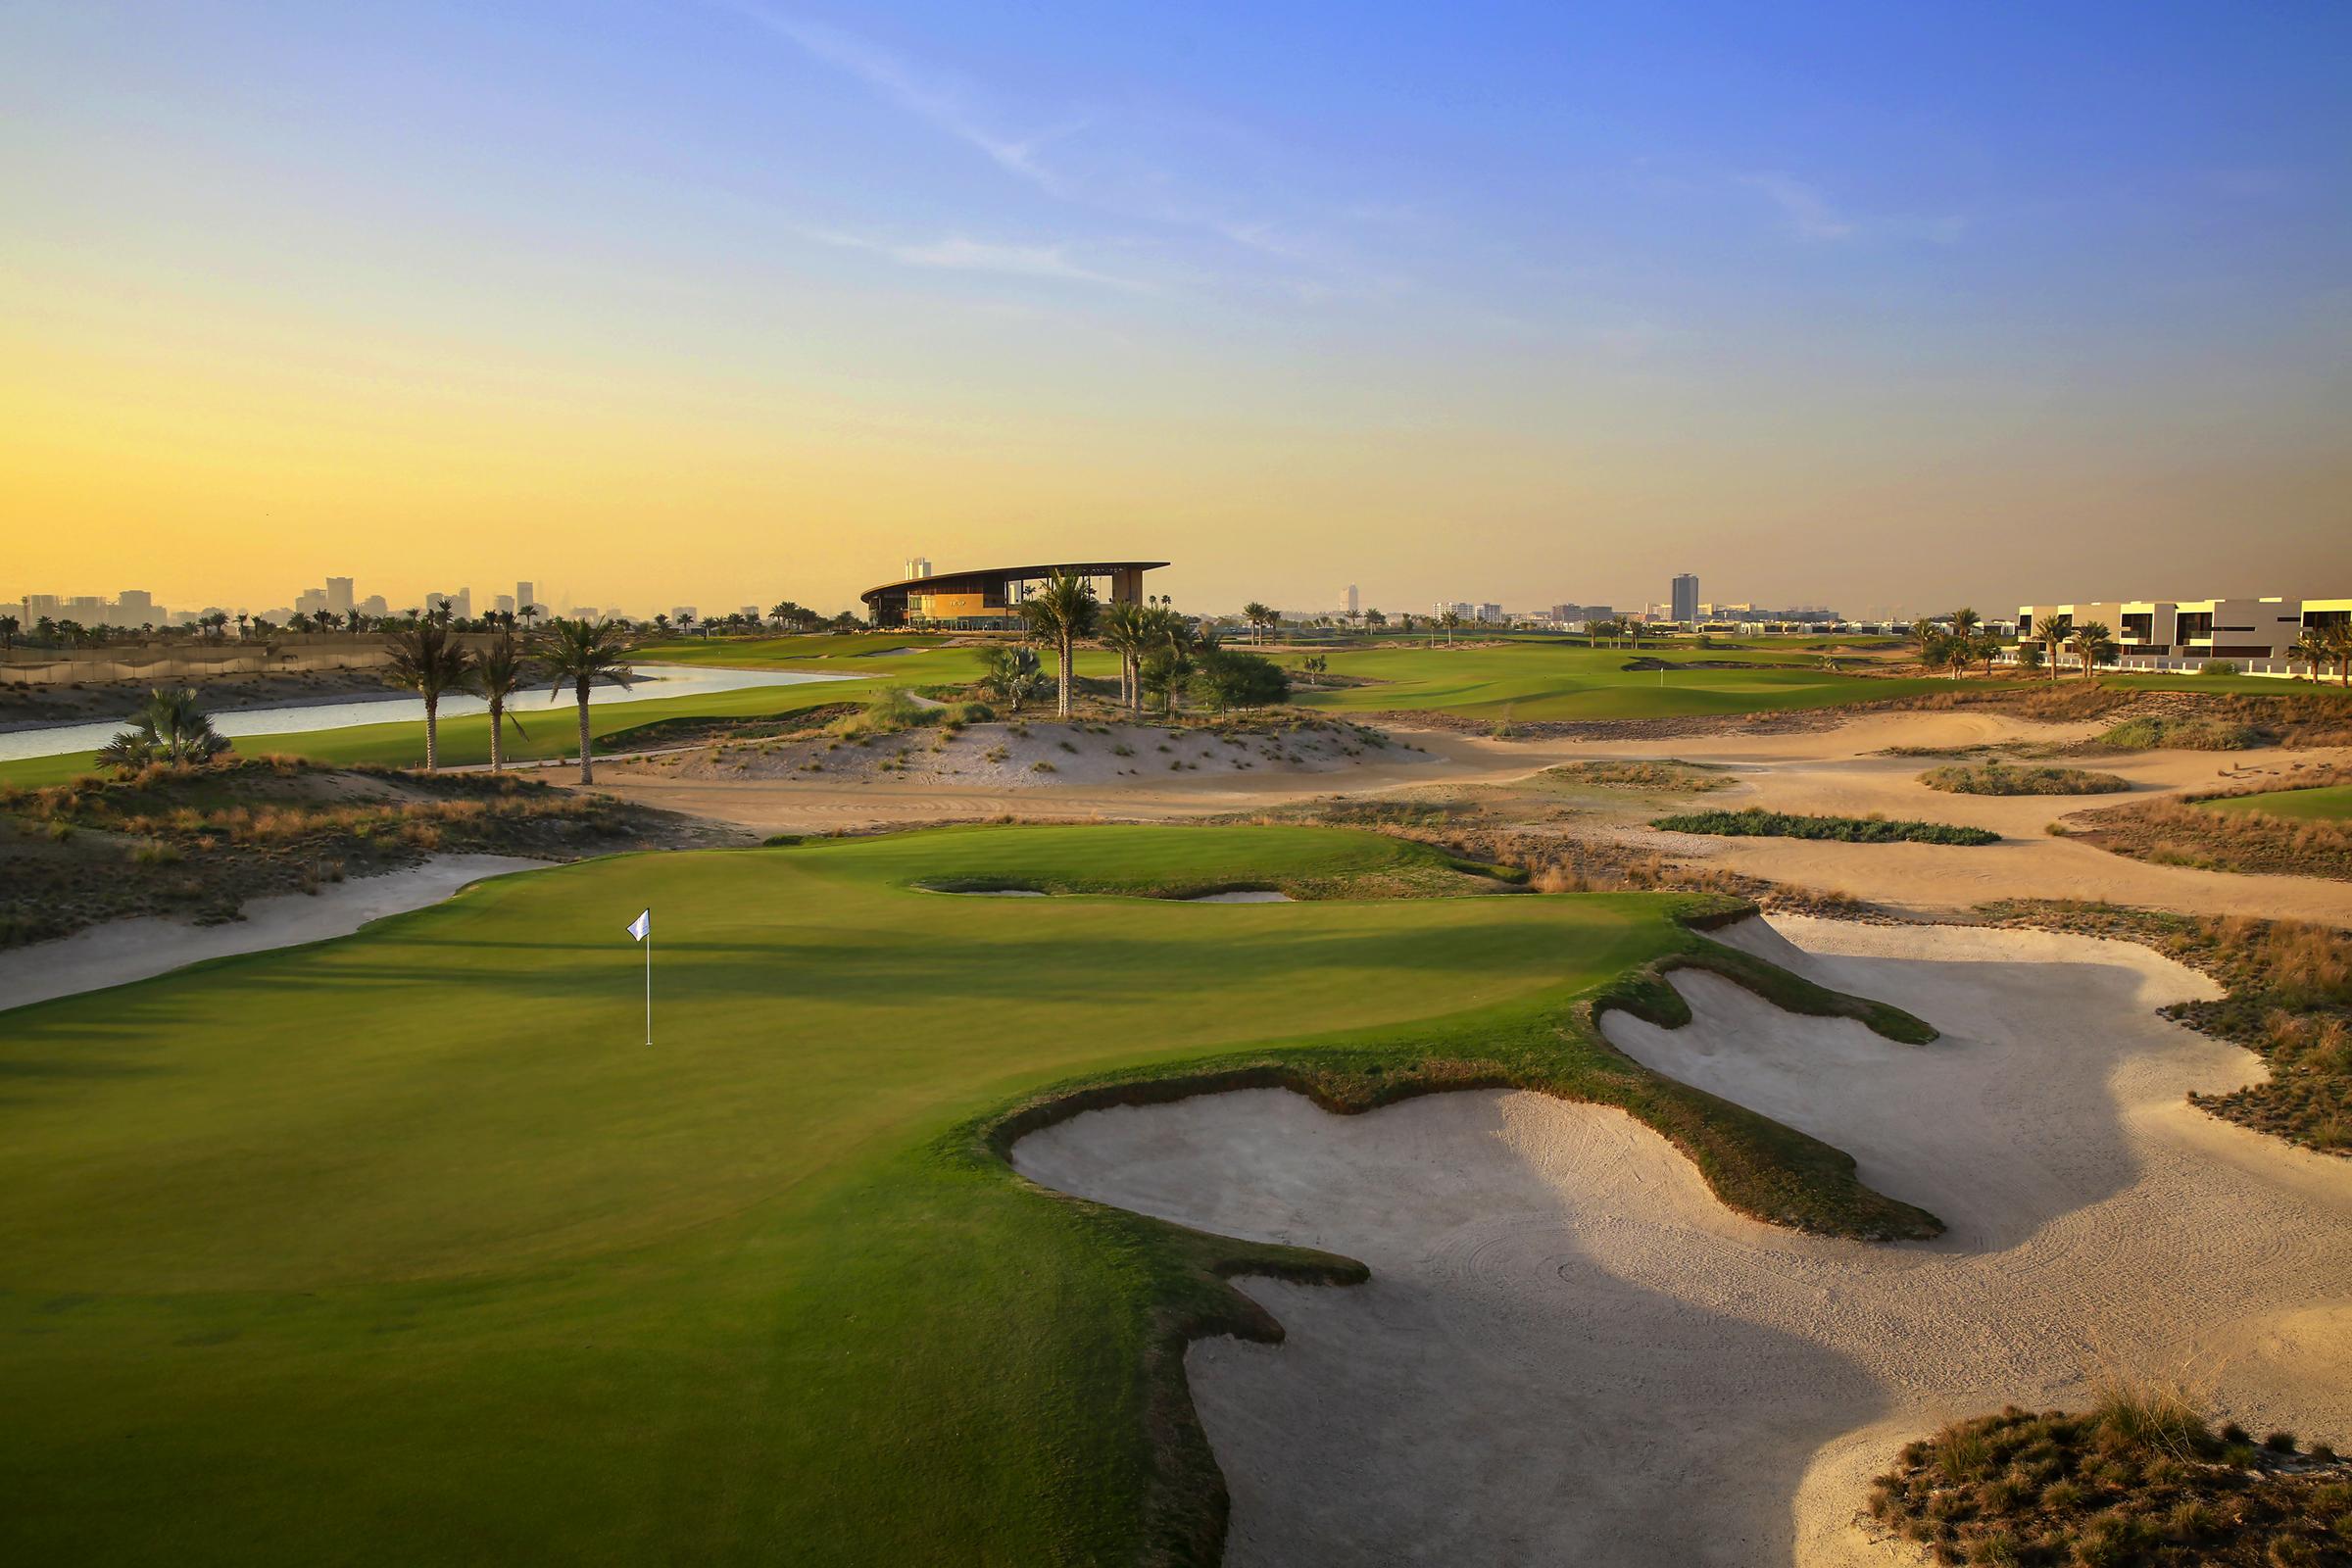 Overview of golf course named Trump International Golf Club Dubai